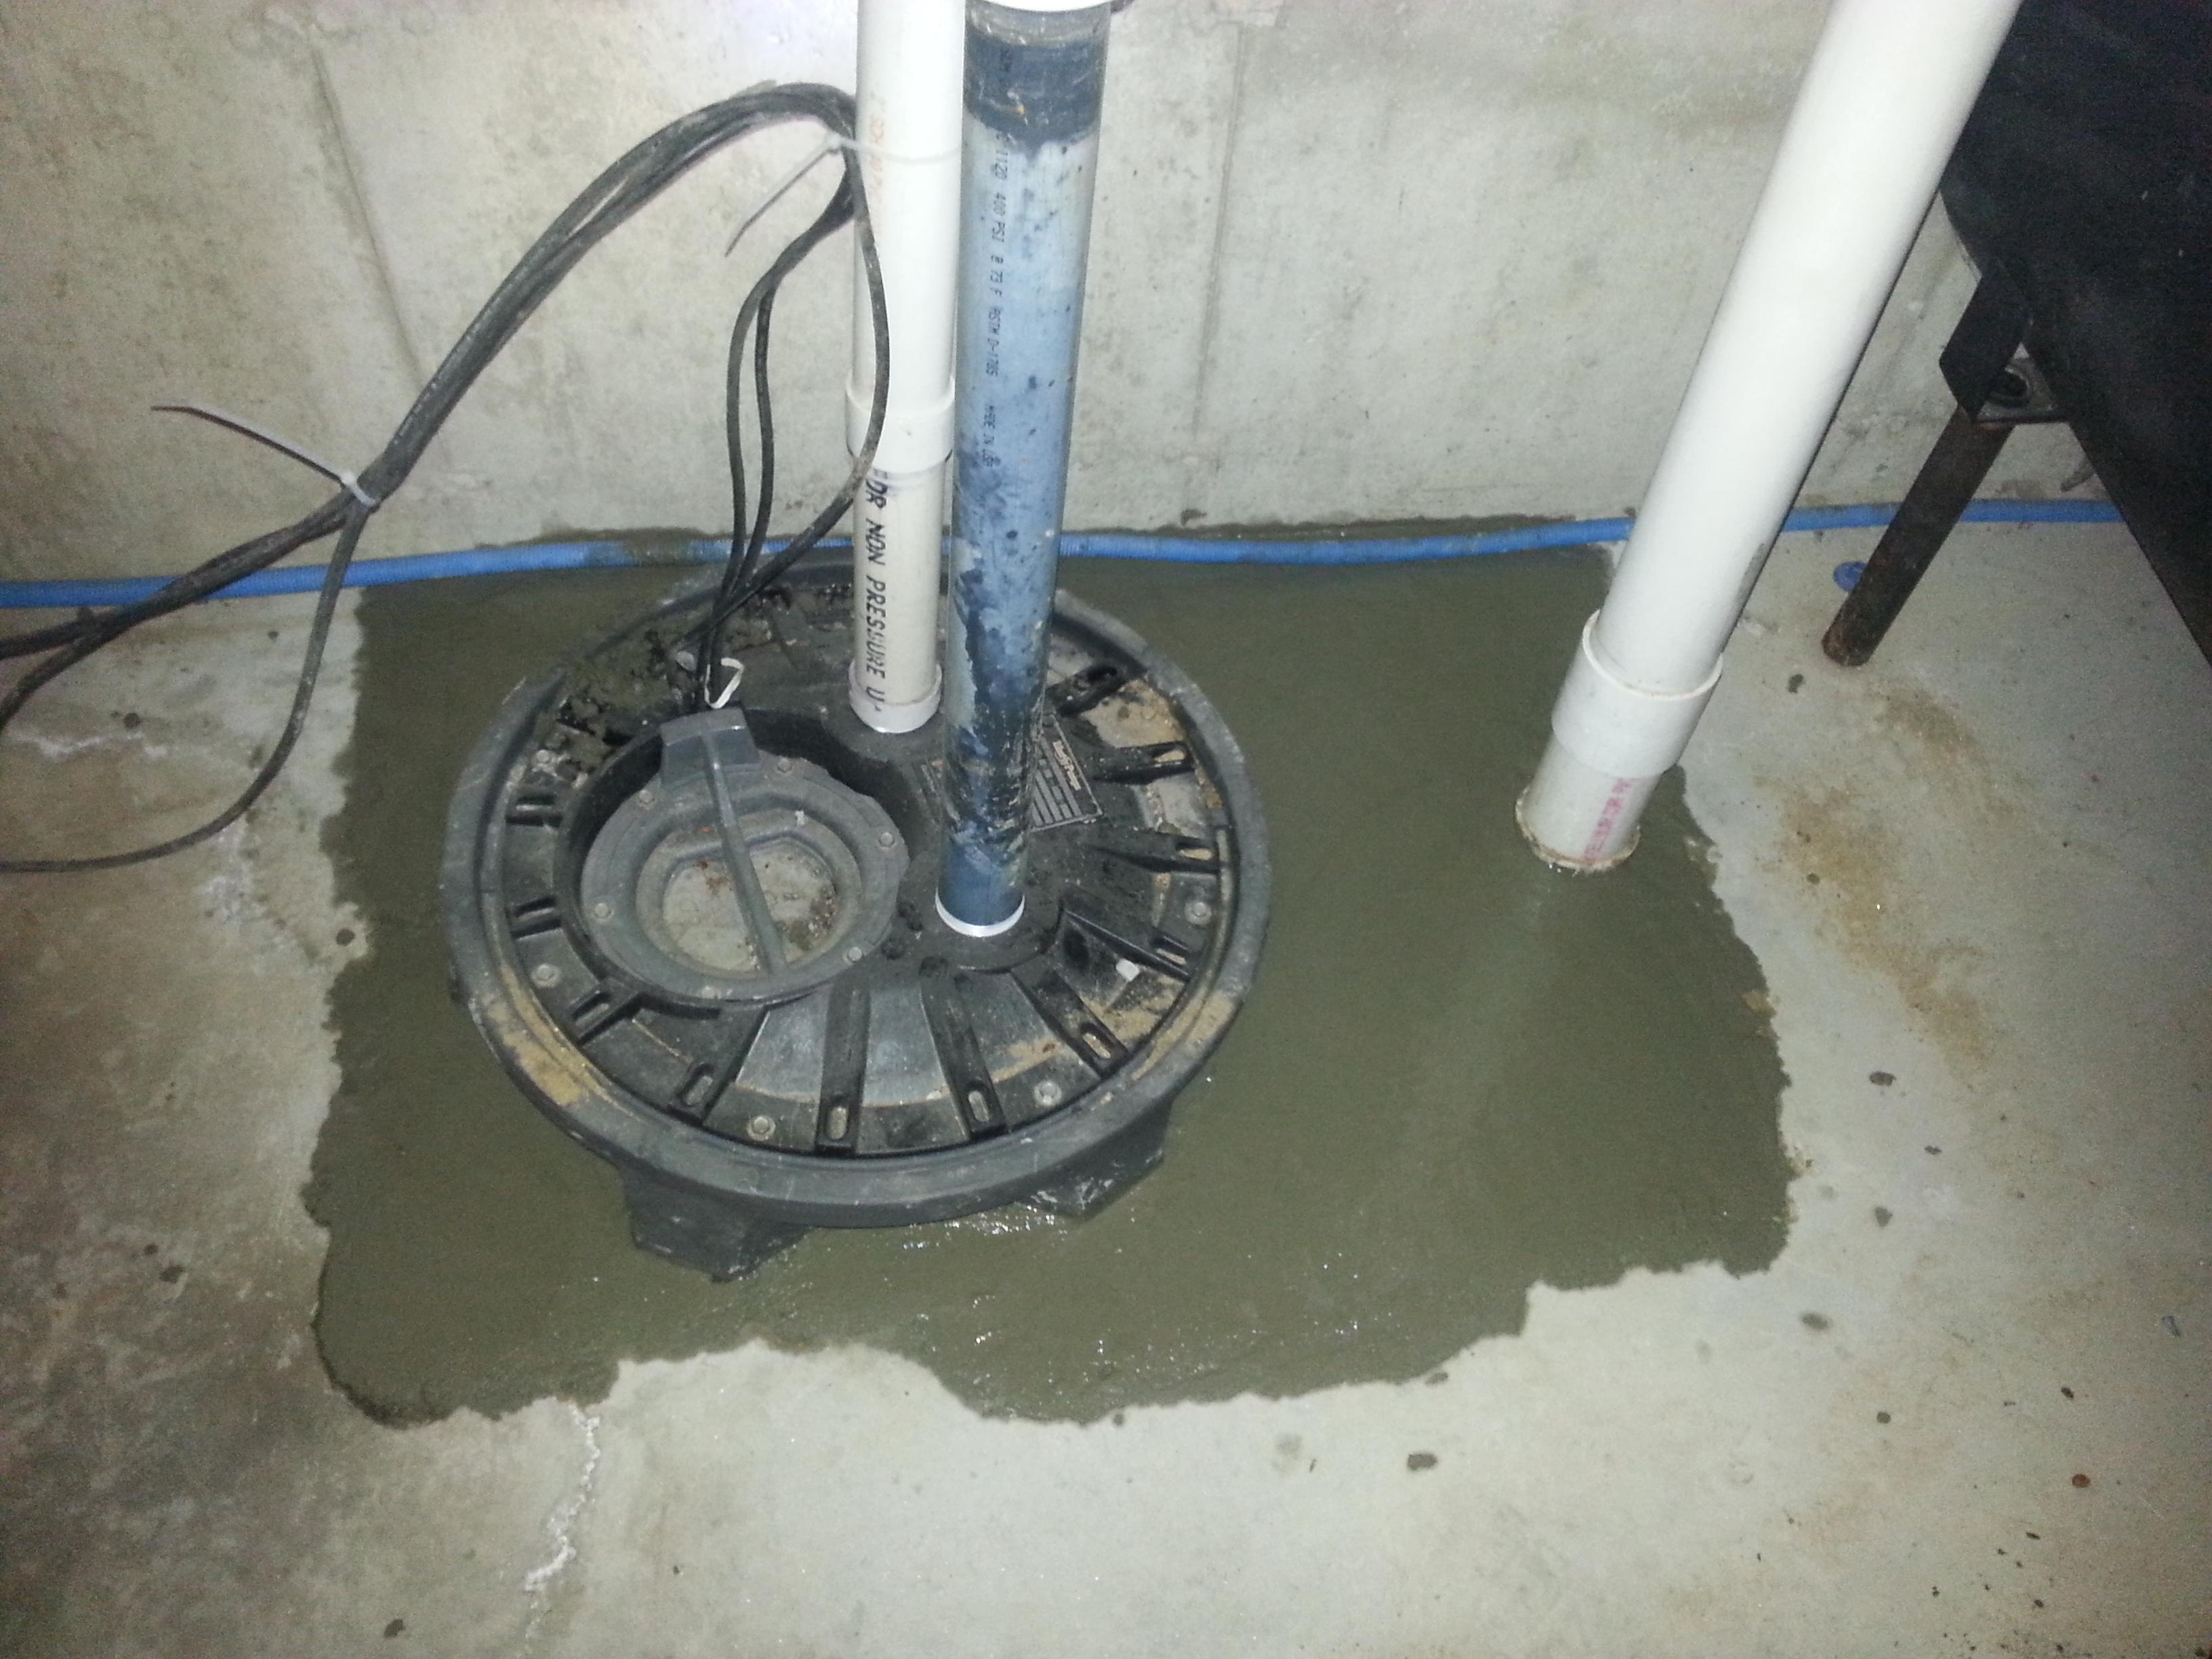 Sewer sump